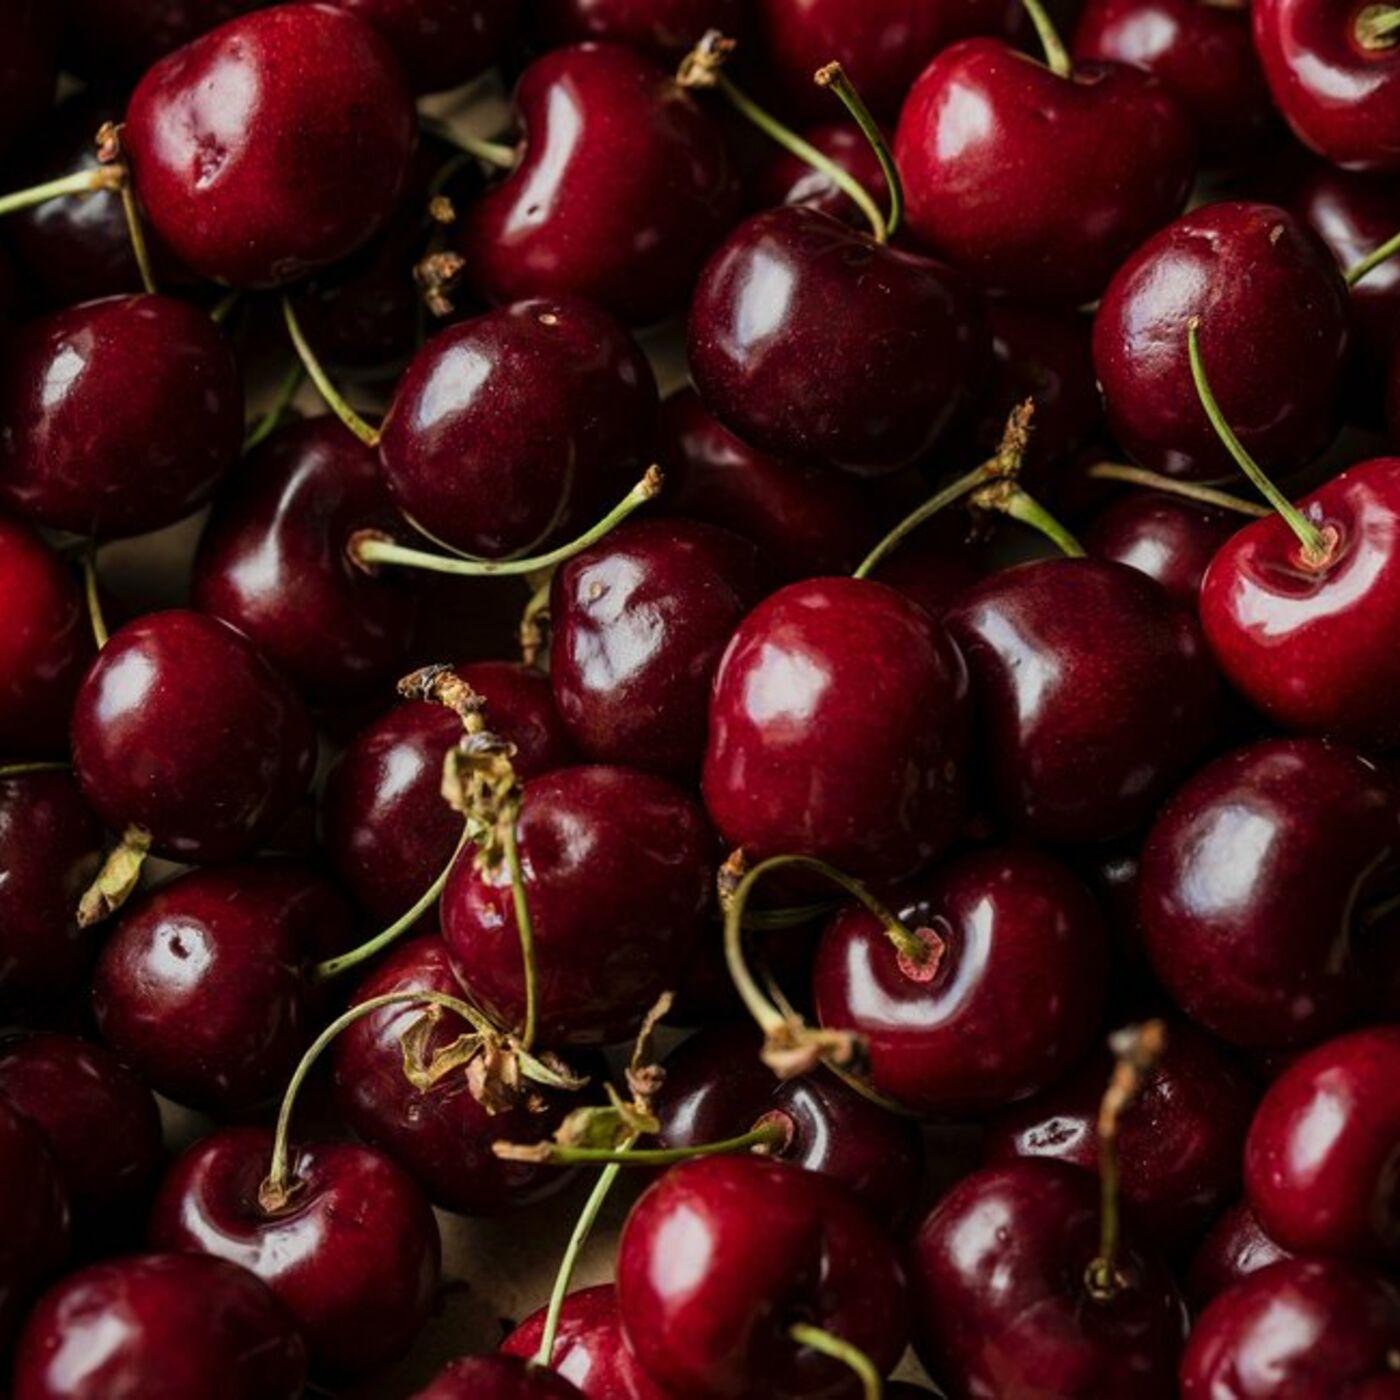 Cherries - A Great Summer Fruit